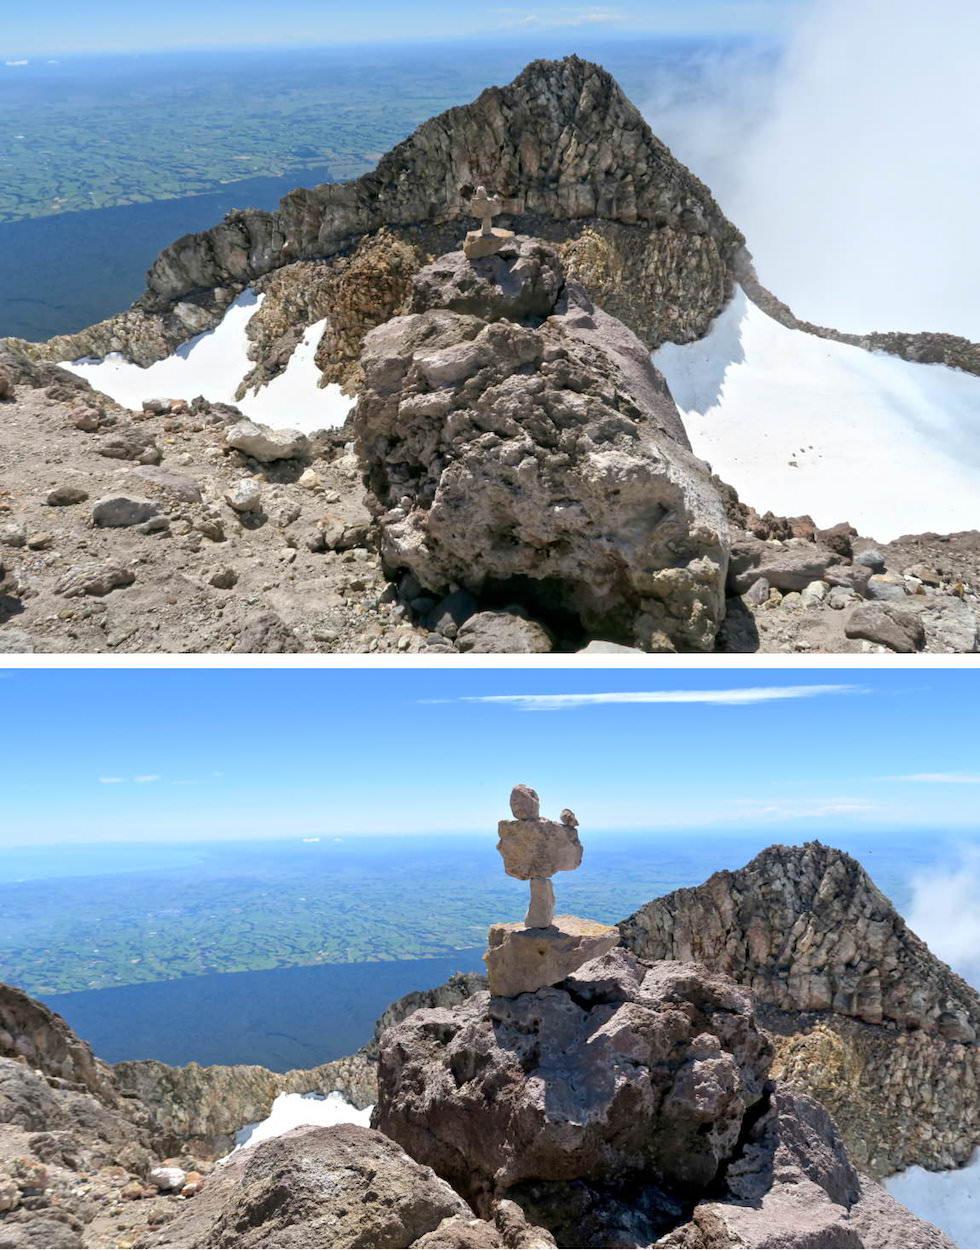 Mt Taranaki Wanderung - Auf dem Gipfel - Egmont National Park - Nordinsel Neuseeland